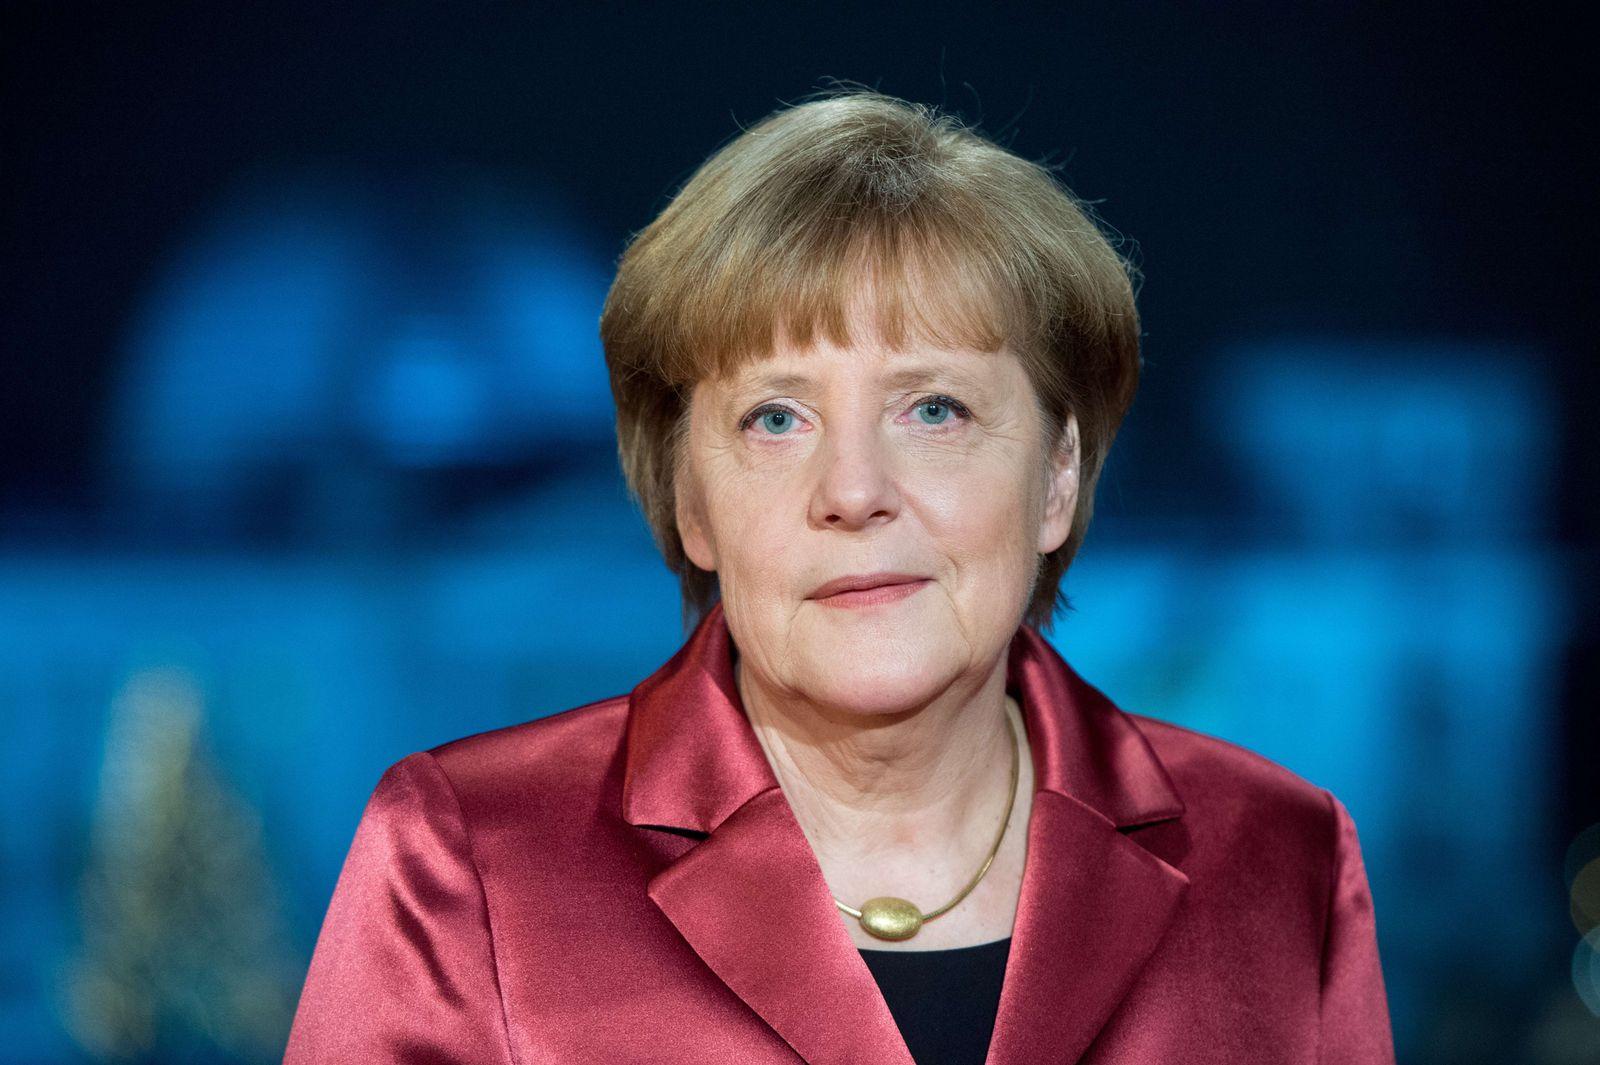 Merkel Neujahrsansprache